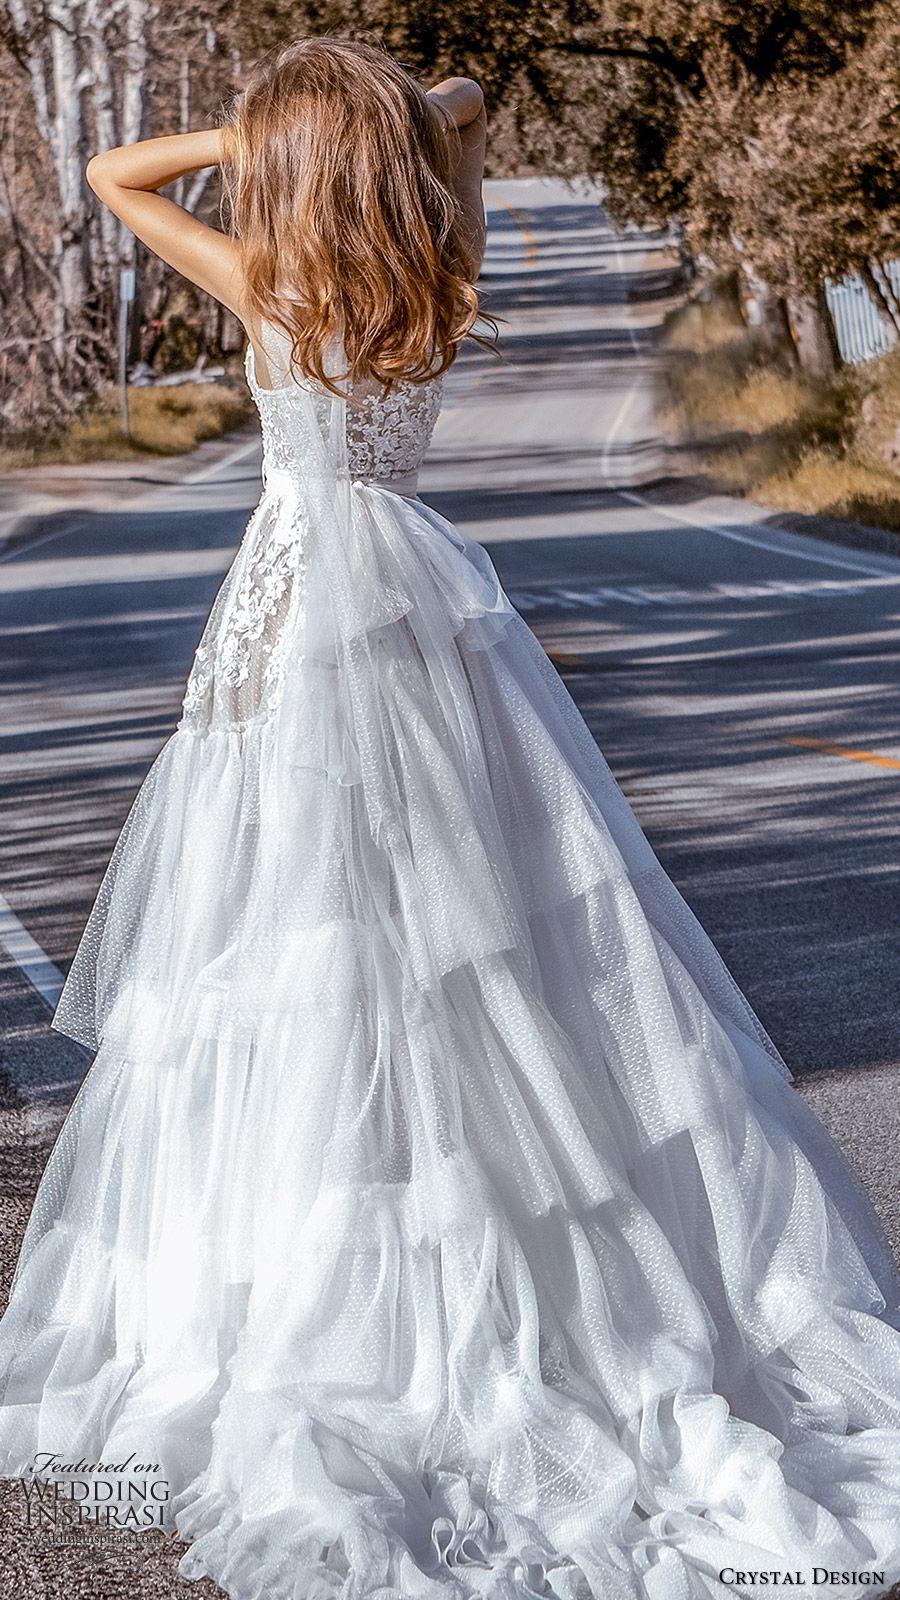 crystal design 2020 couture bridal sleeveless halter neck lace bodice drop waist ball gown wedding dress (6) romantic boho chic chapel train bv